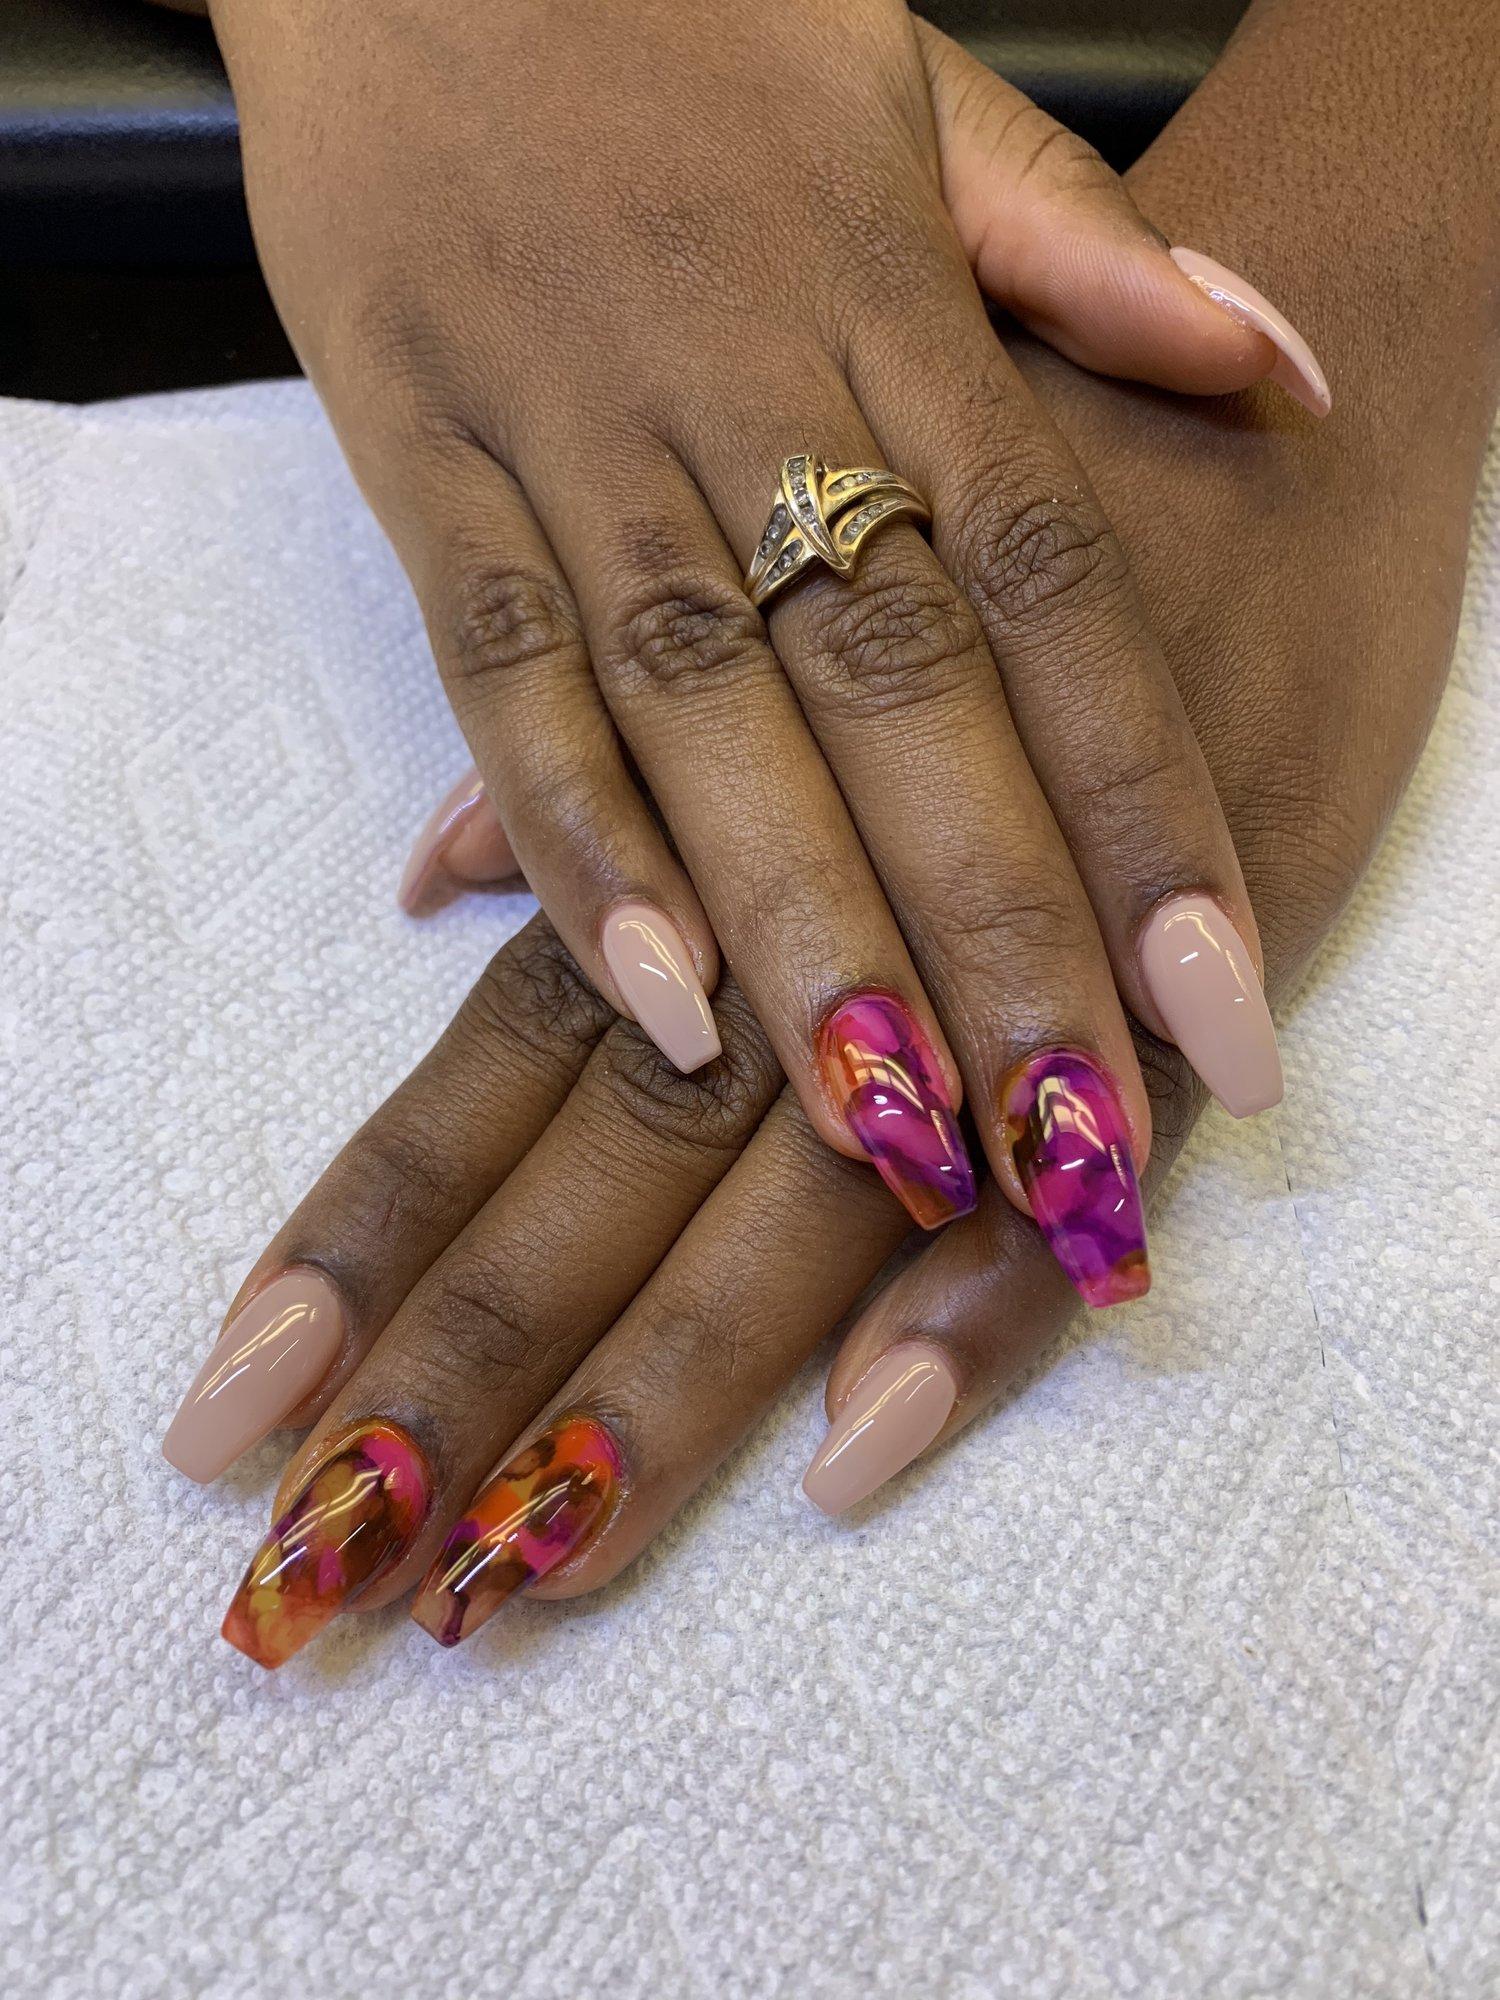 gel-nail-salon-near-me.jpg